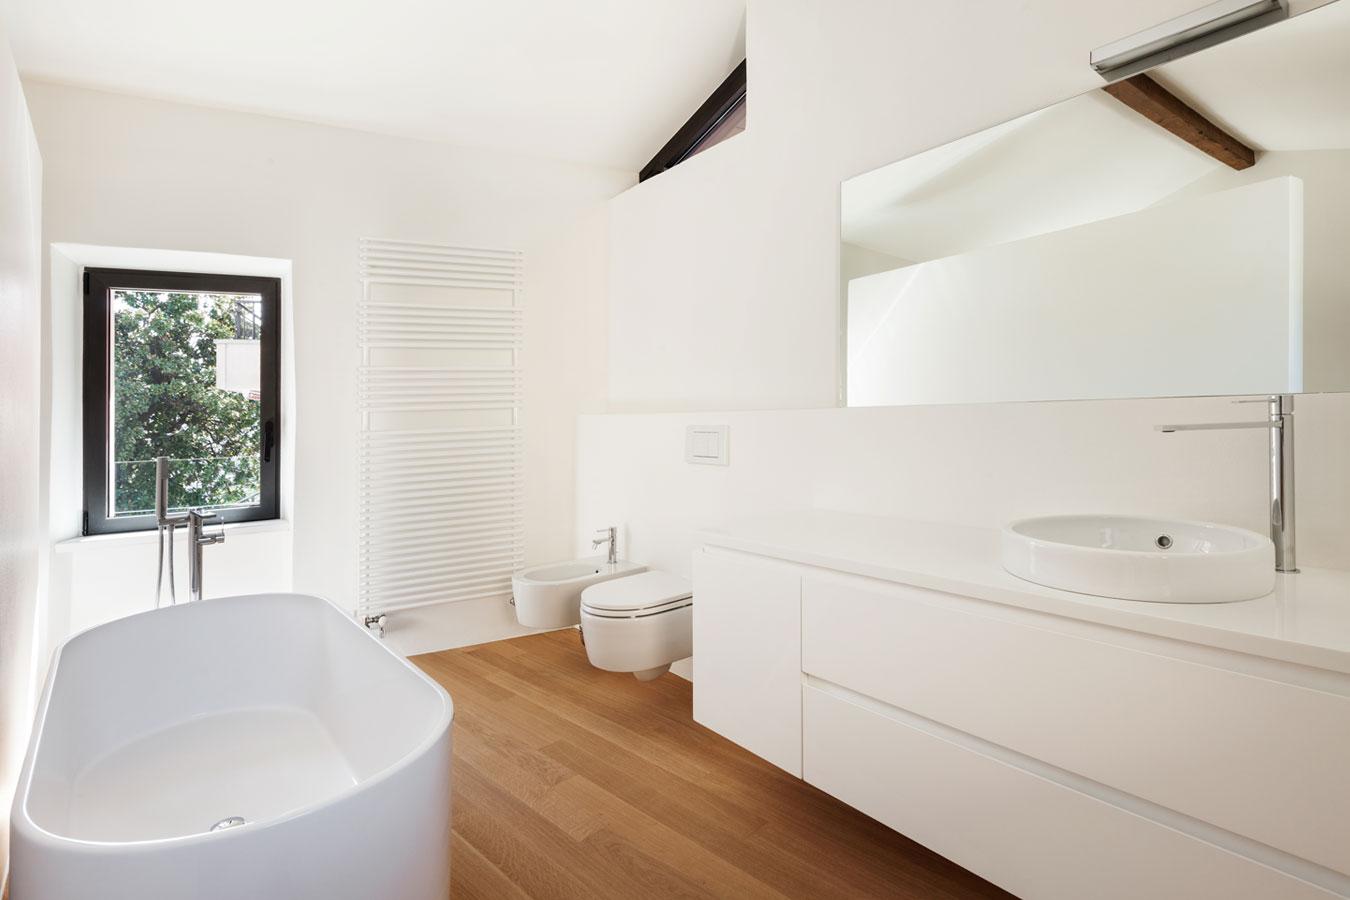 10 dingen om nu weg te gooien uit je badkamer moeders minimalisme